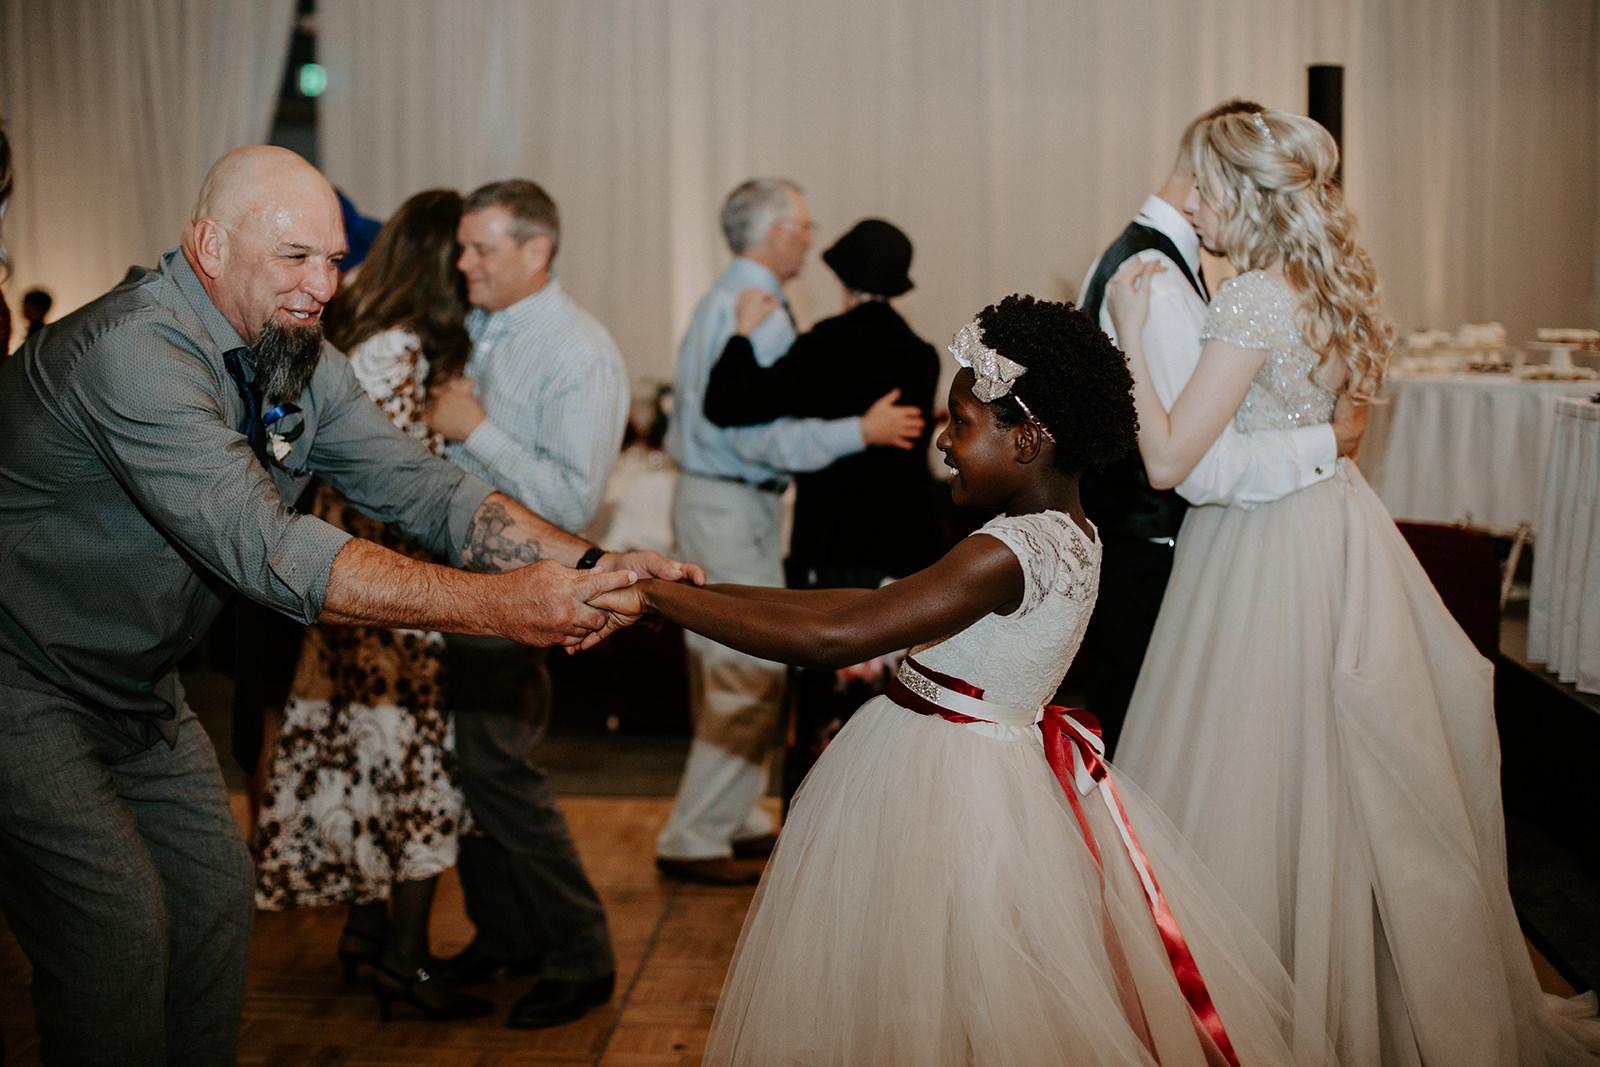 Granddad dancing with granddaughter during dancing in ballroom